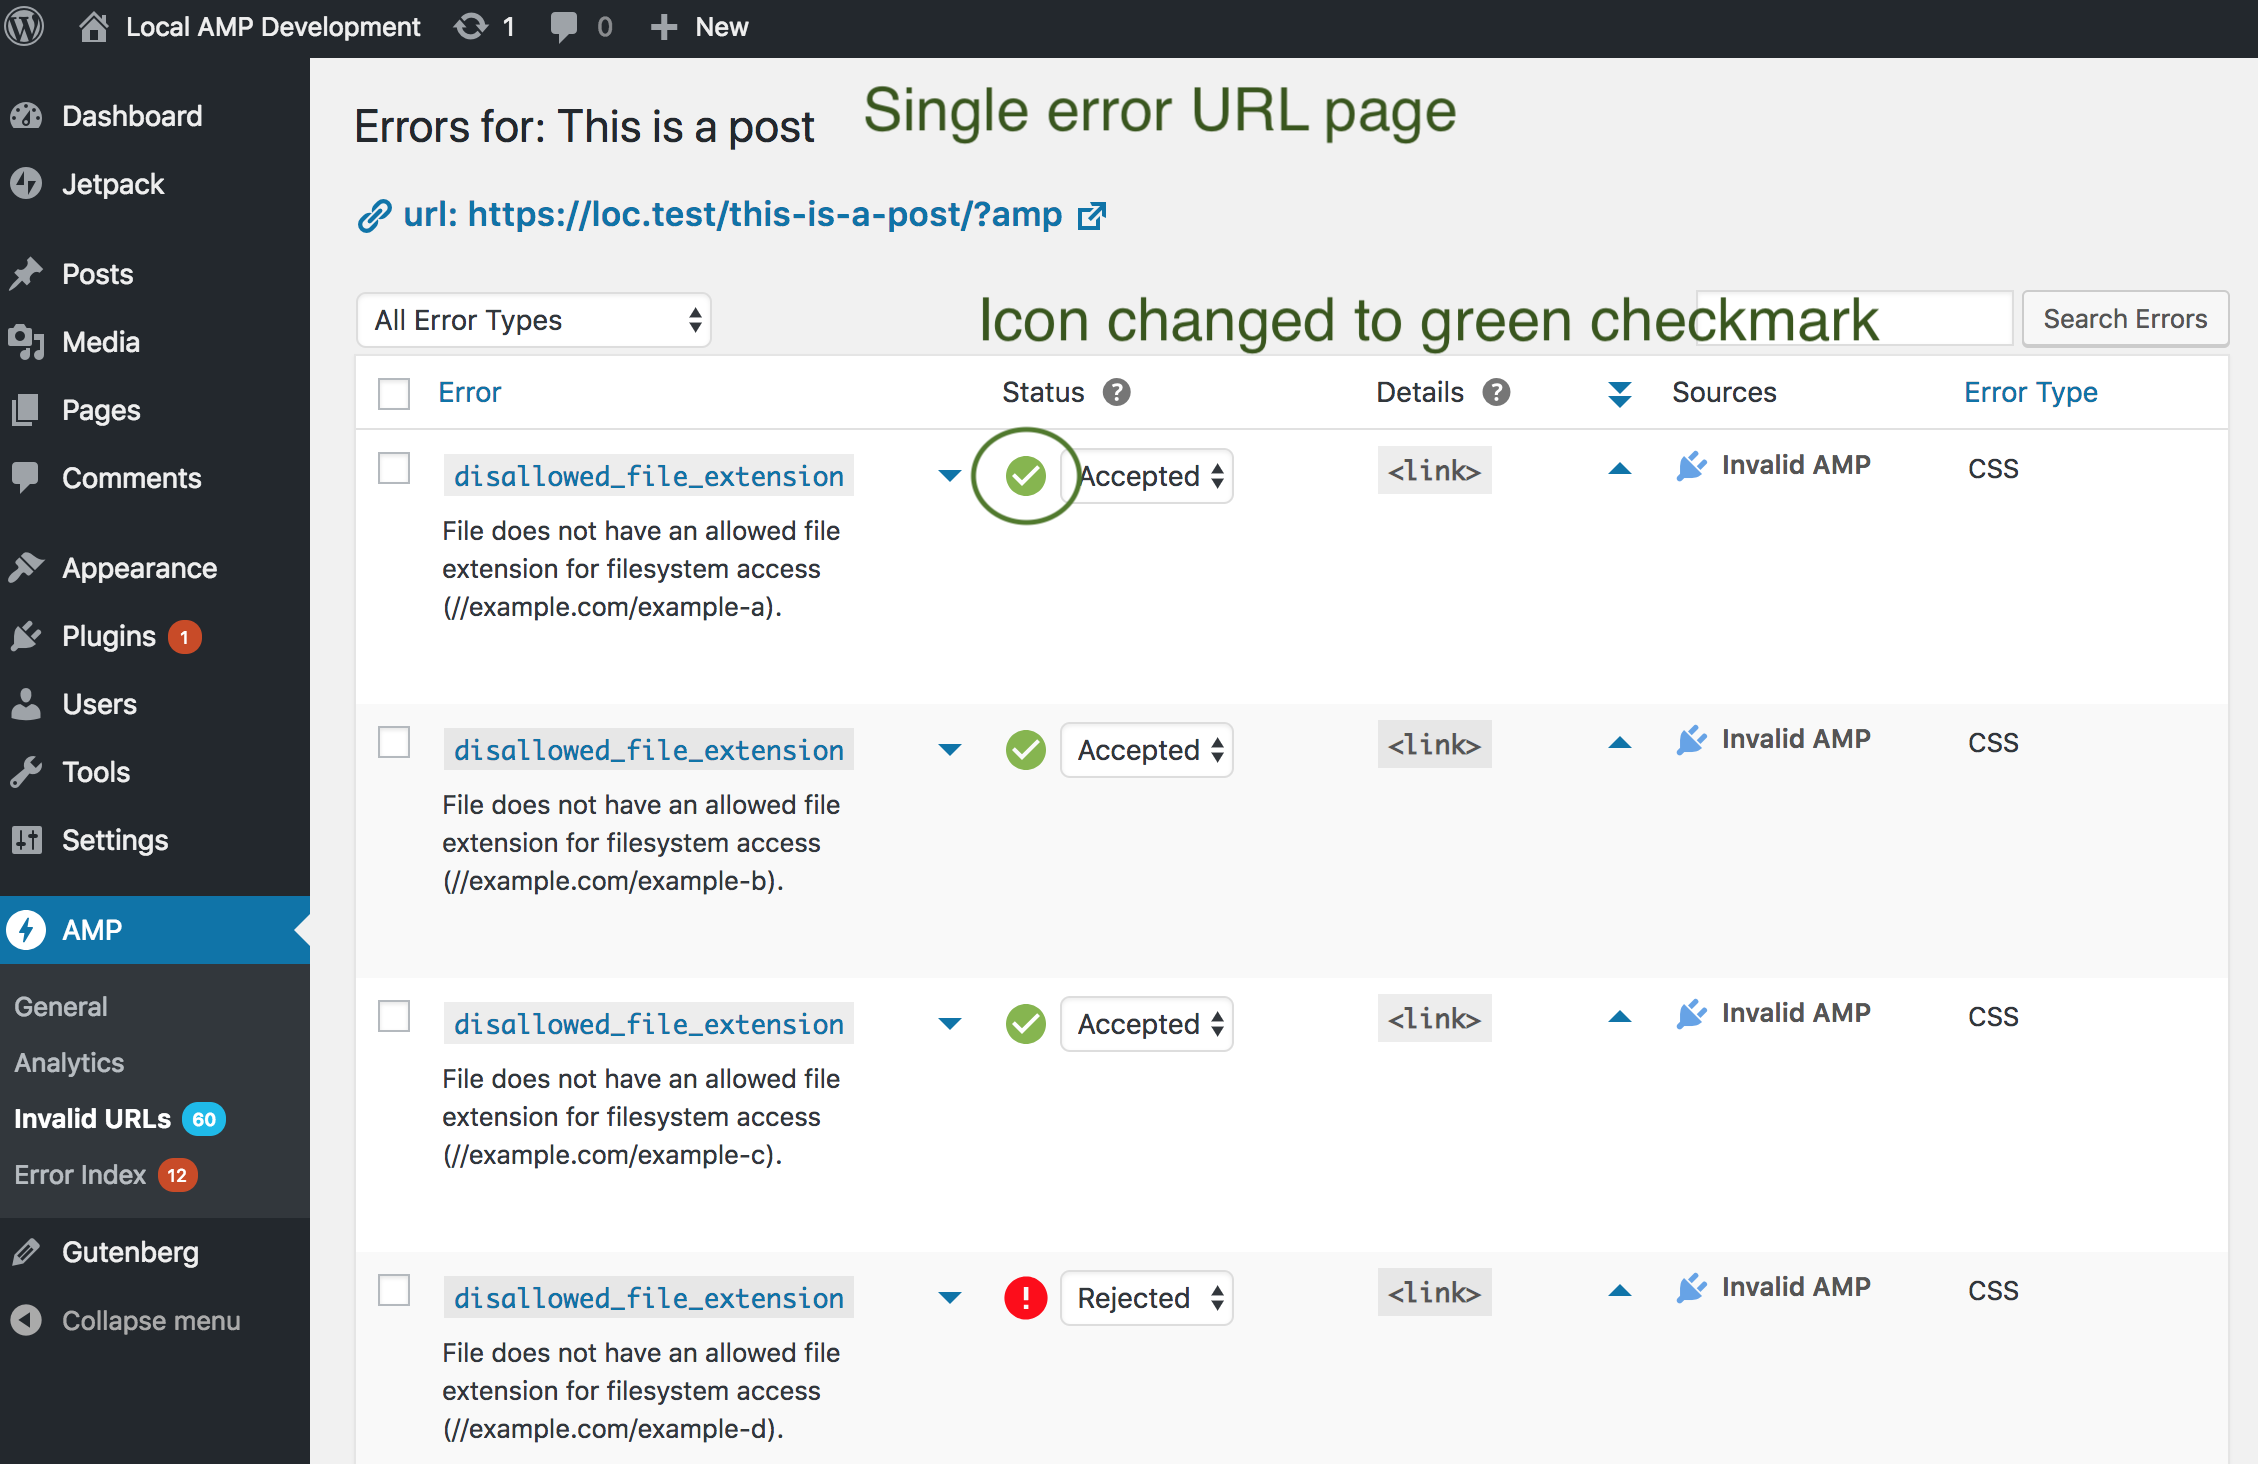 single-error-url-page